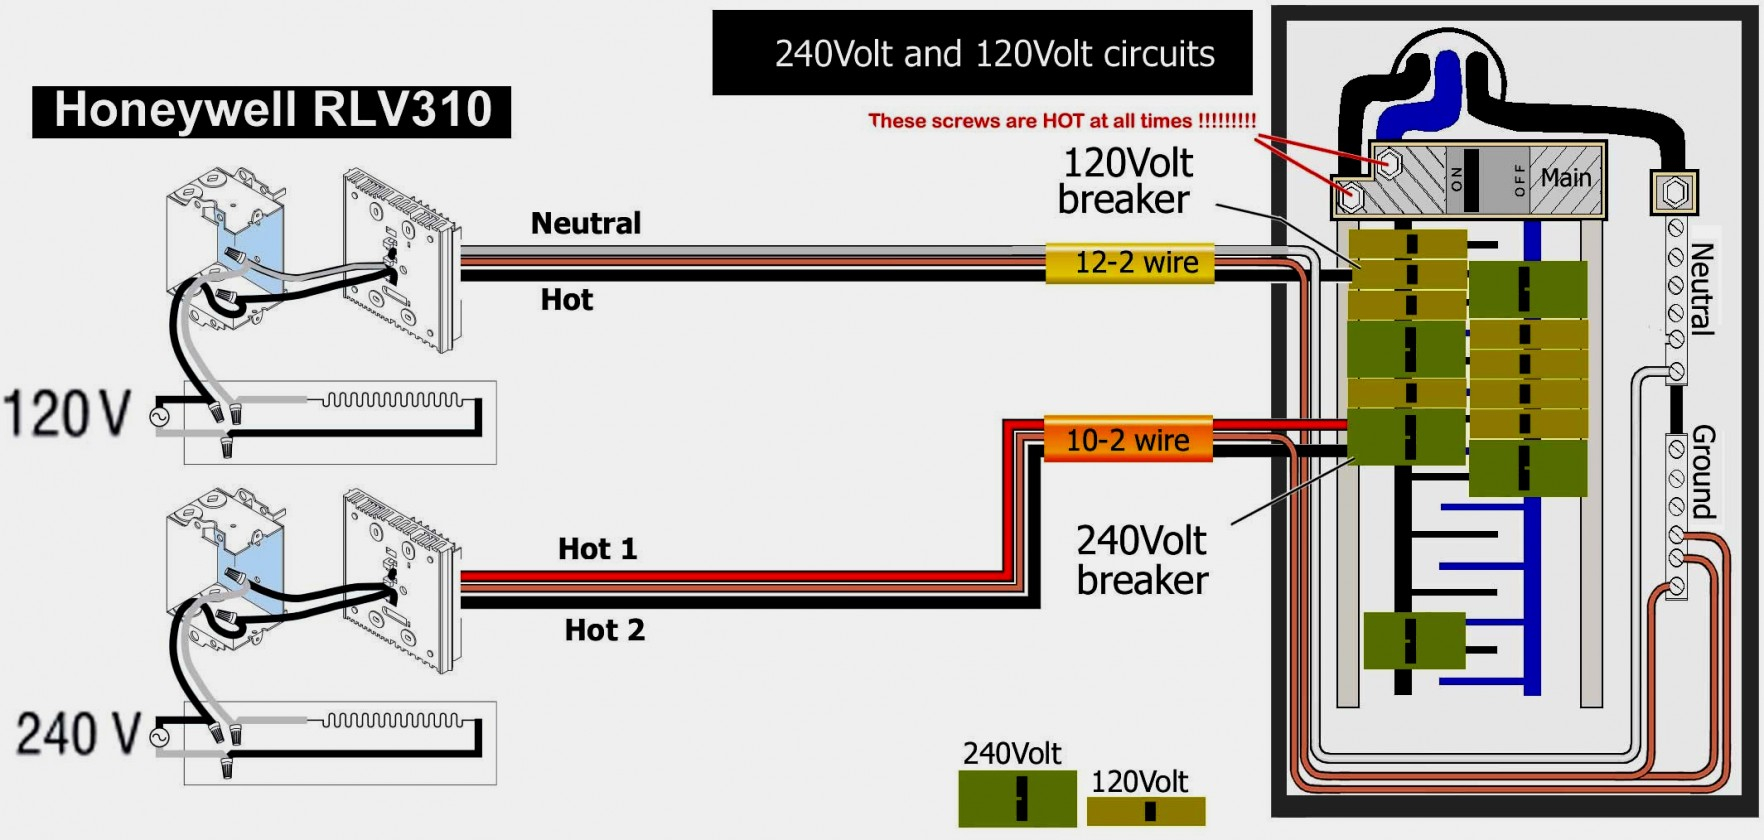 240 Volt Wire Diagram - Well Pump Electrical Circuit Diagram for Wiring  Diagram SchematicsWiring Diagram Schematics